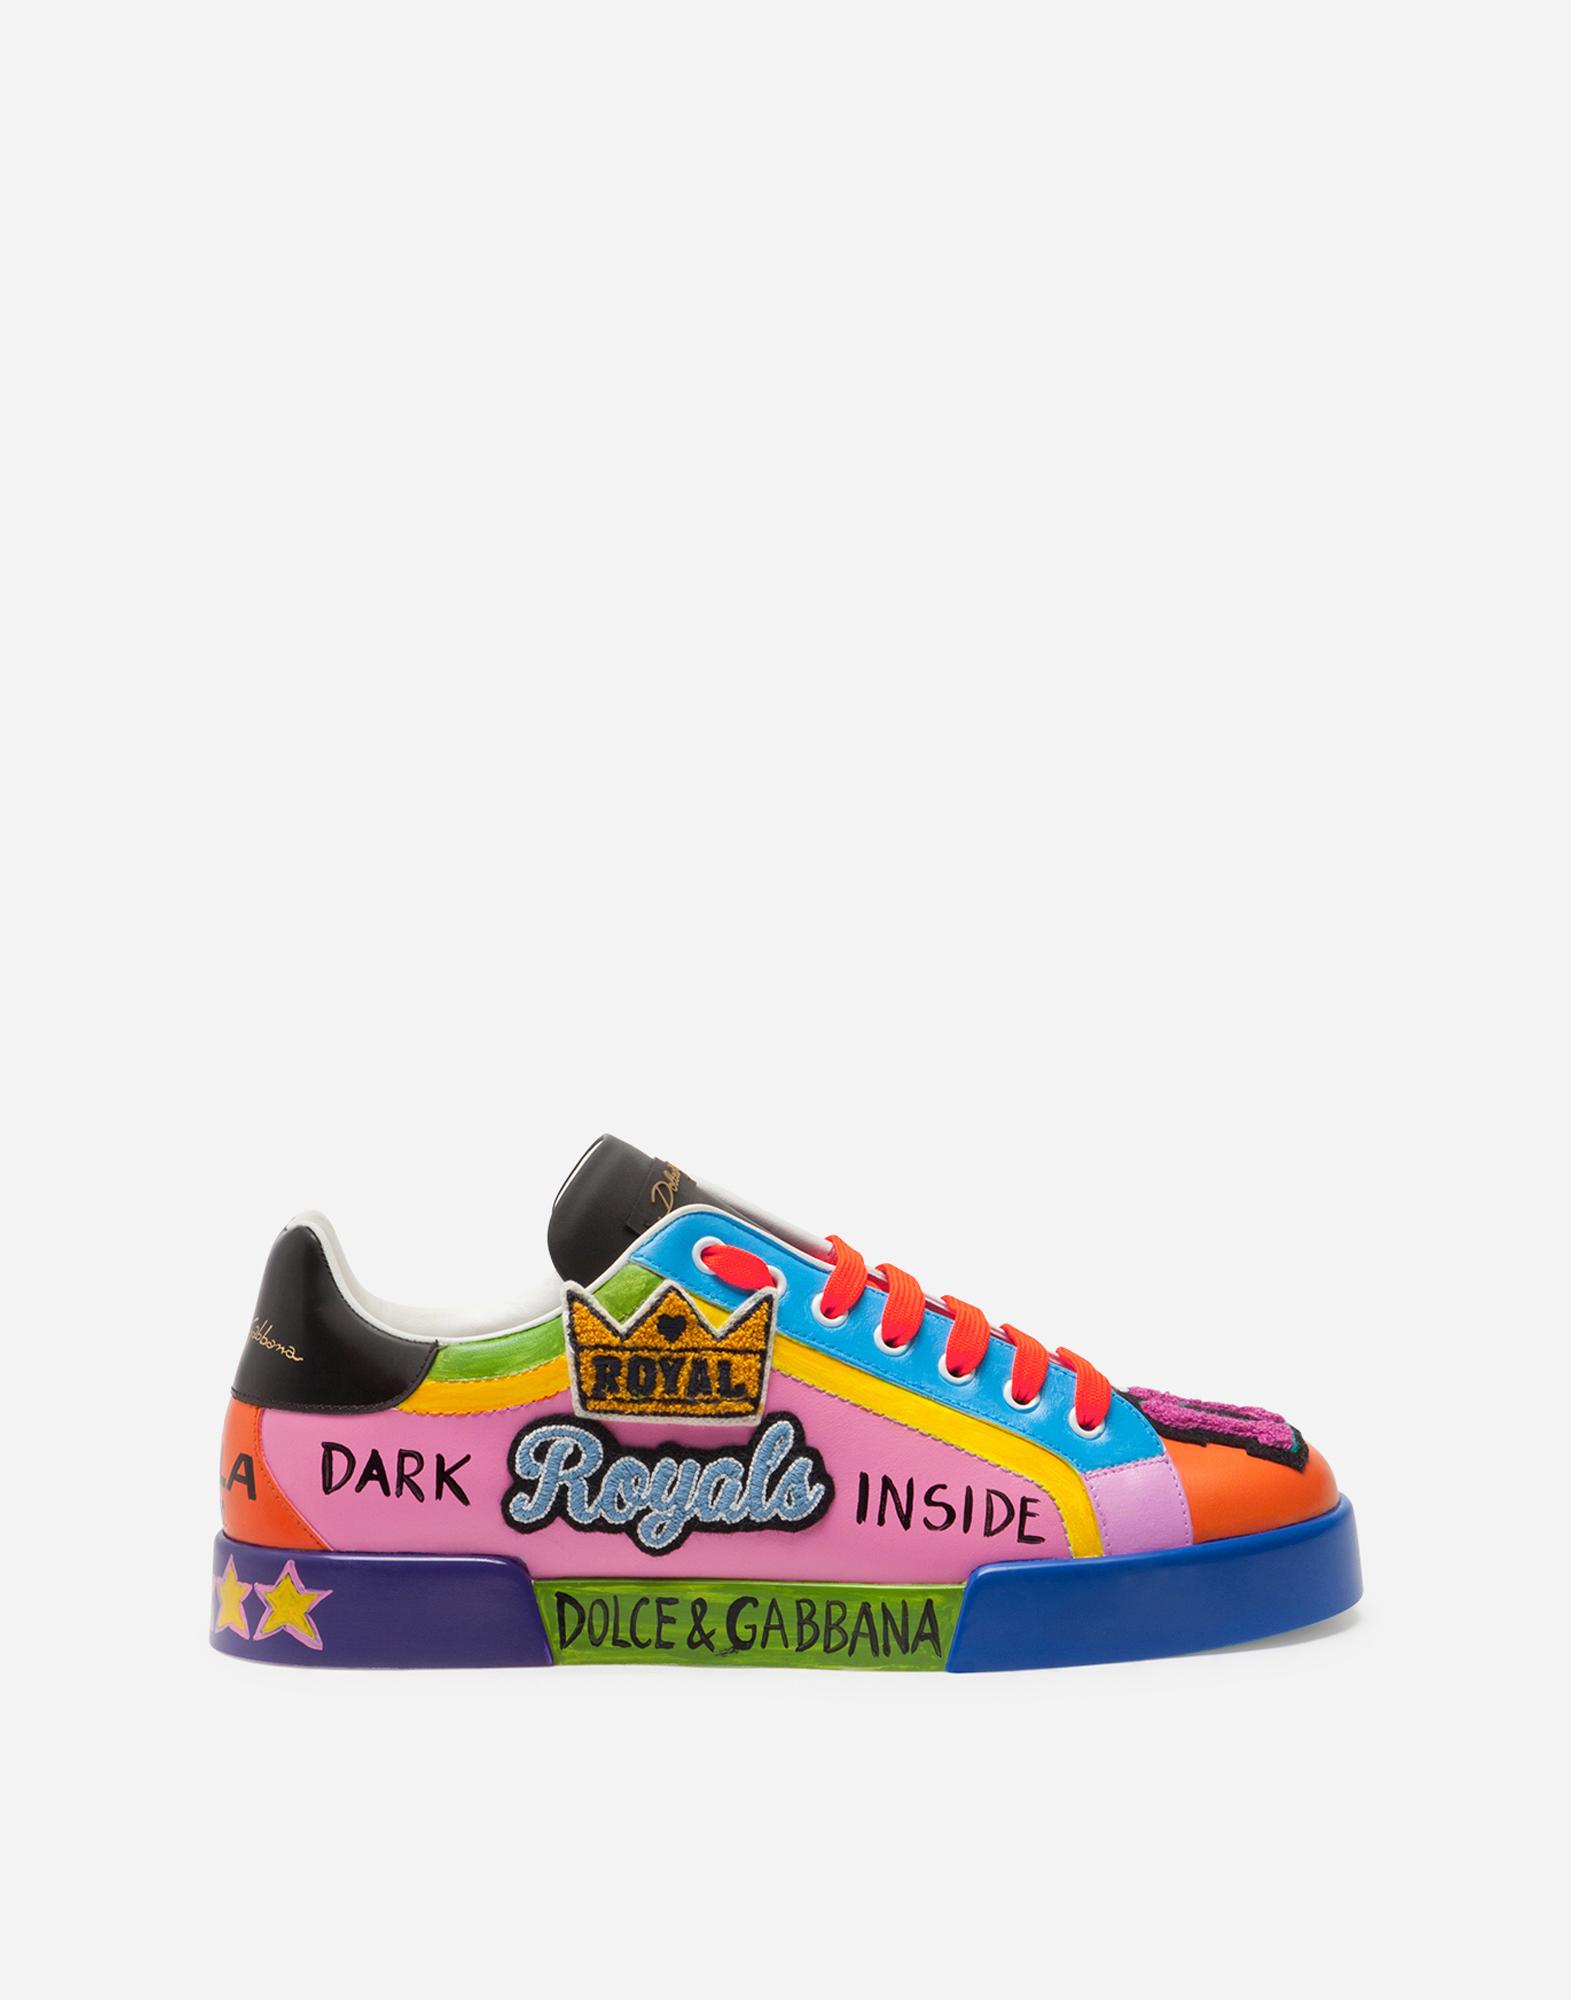 Dolce \u0026 Gabbana Portofino Sneakers By